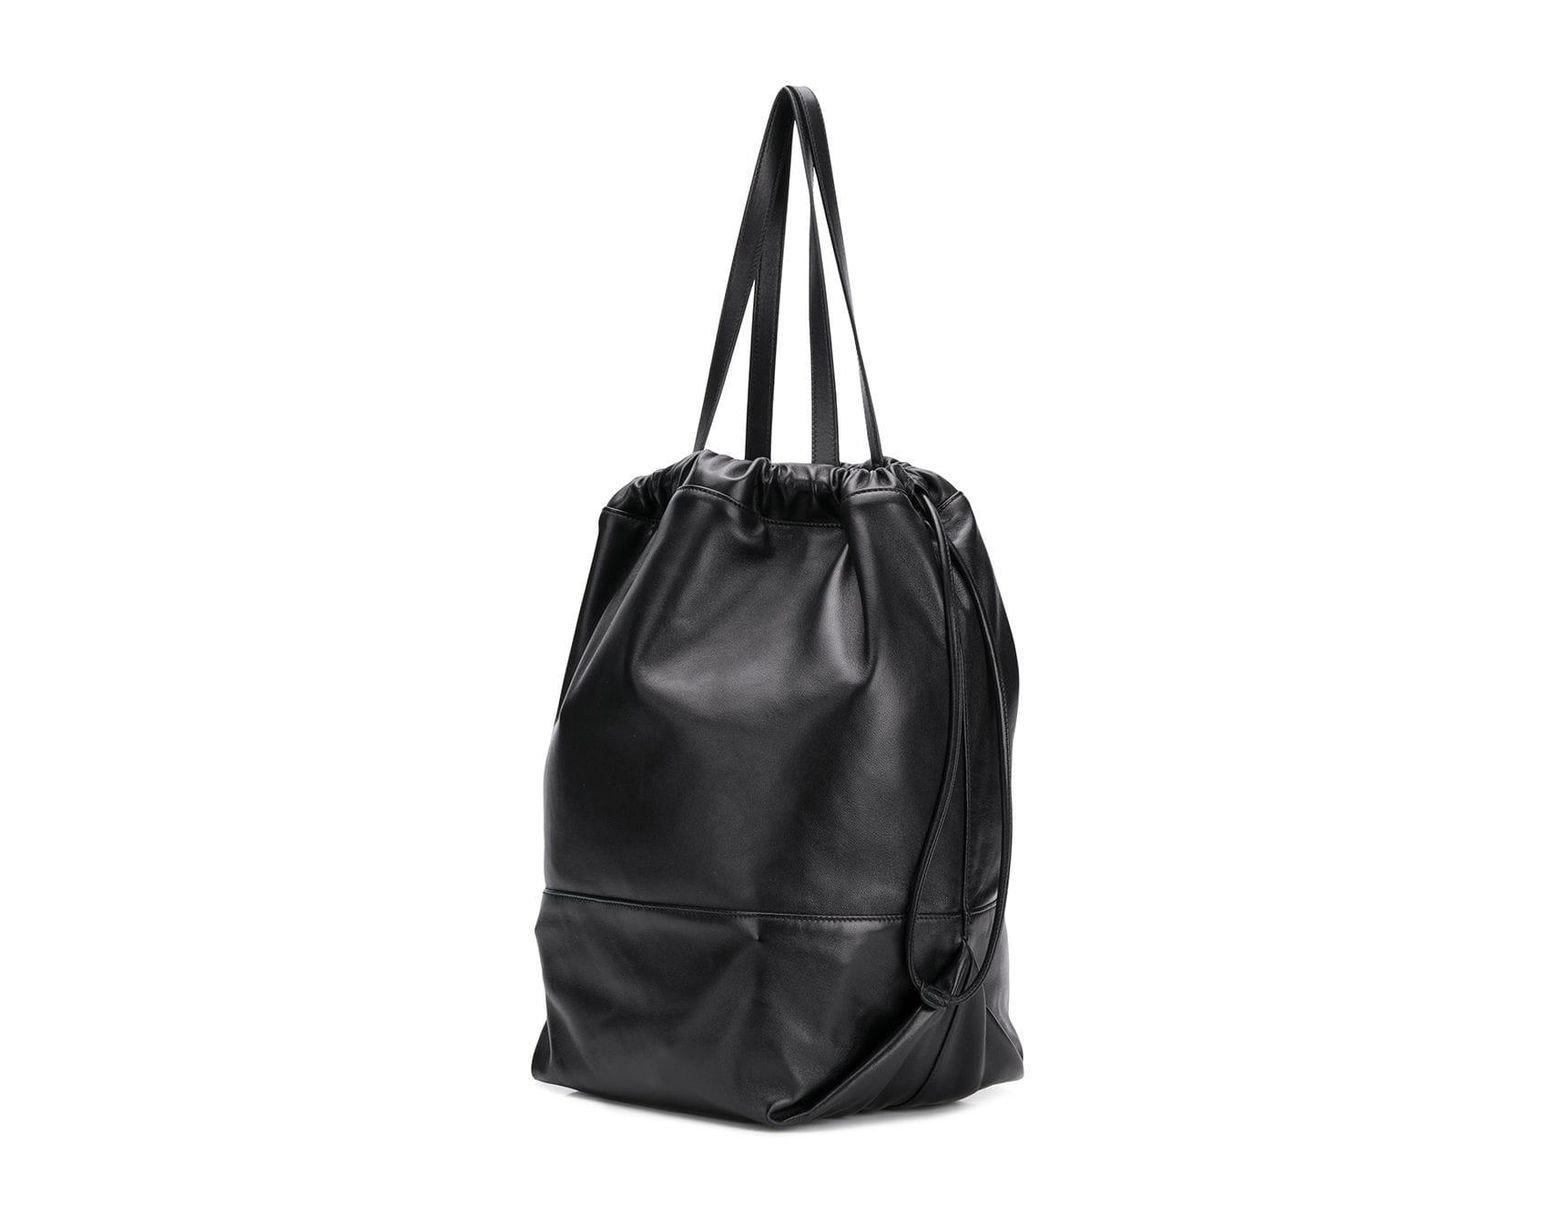 0b9ce00eb35 Saint Laurent Teddy Drawstring Bag in Black - Lyst